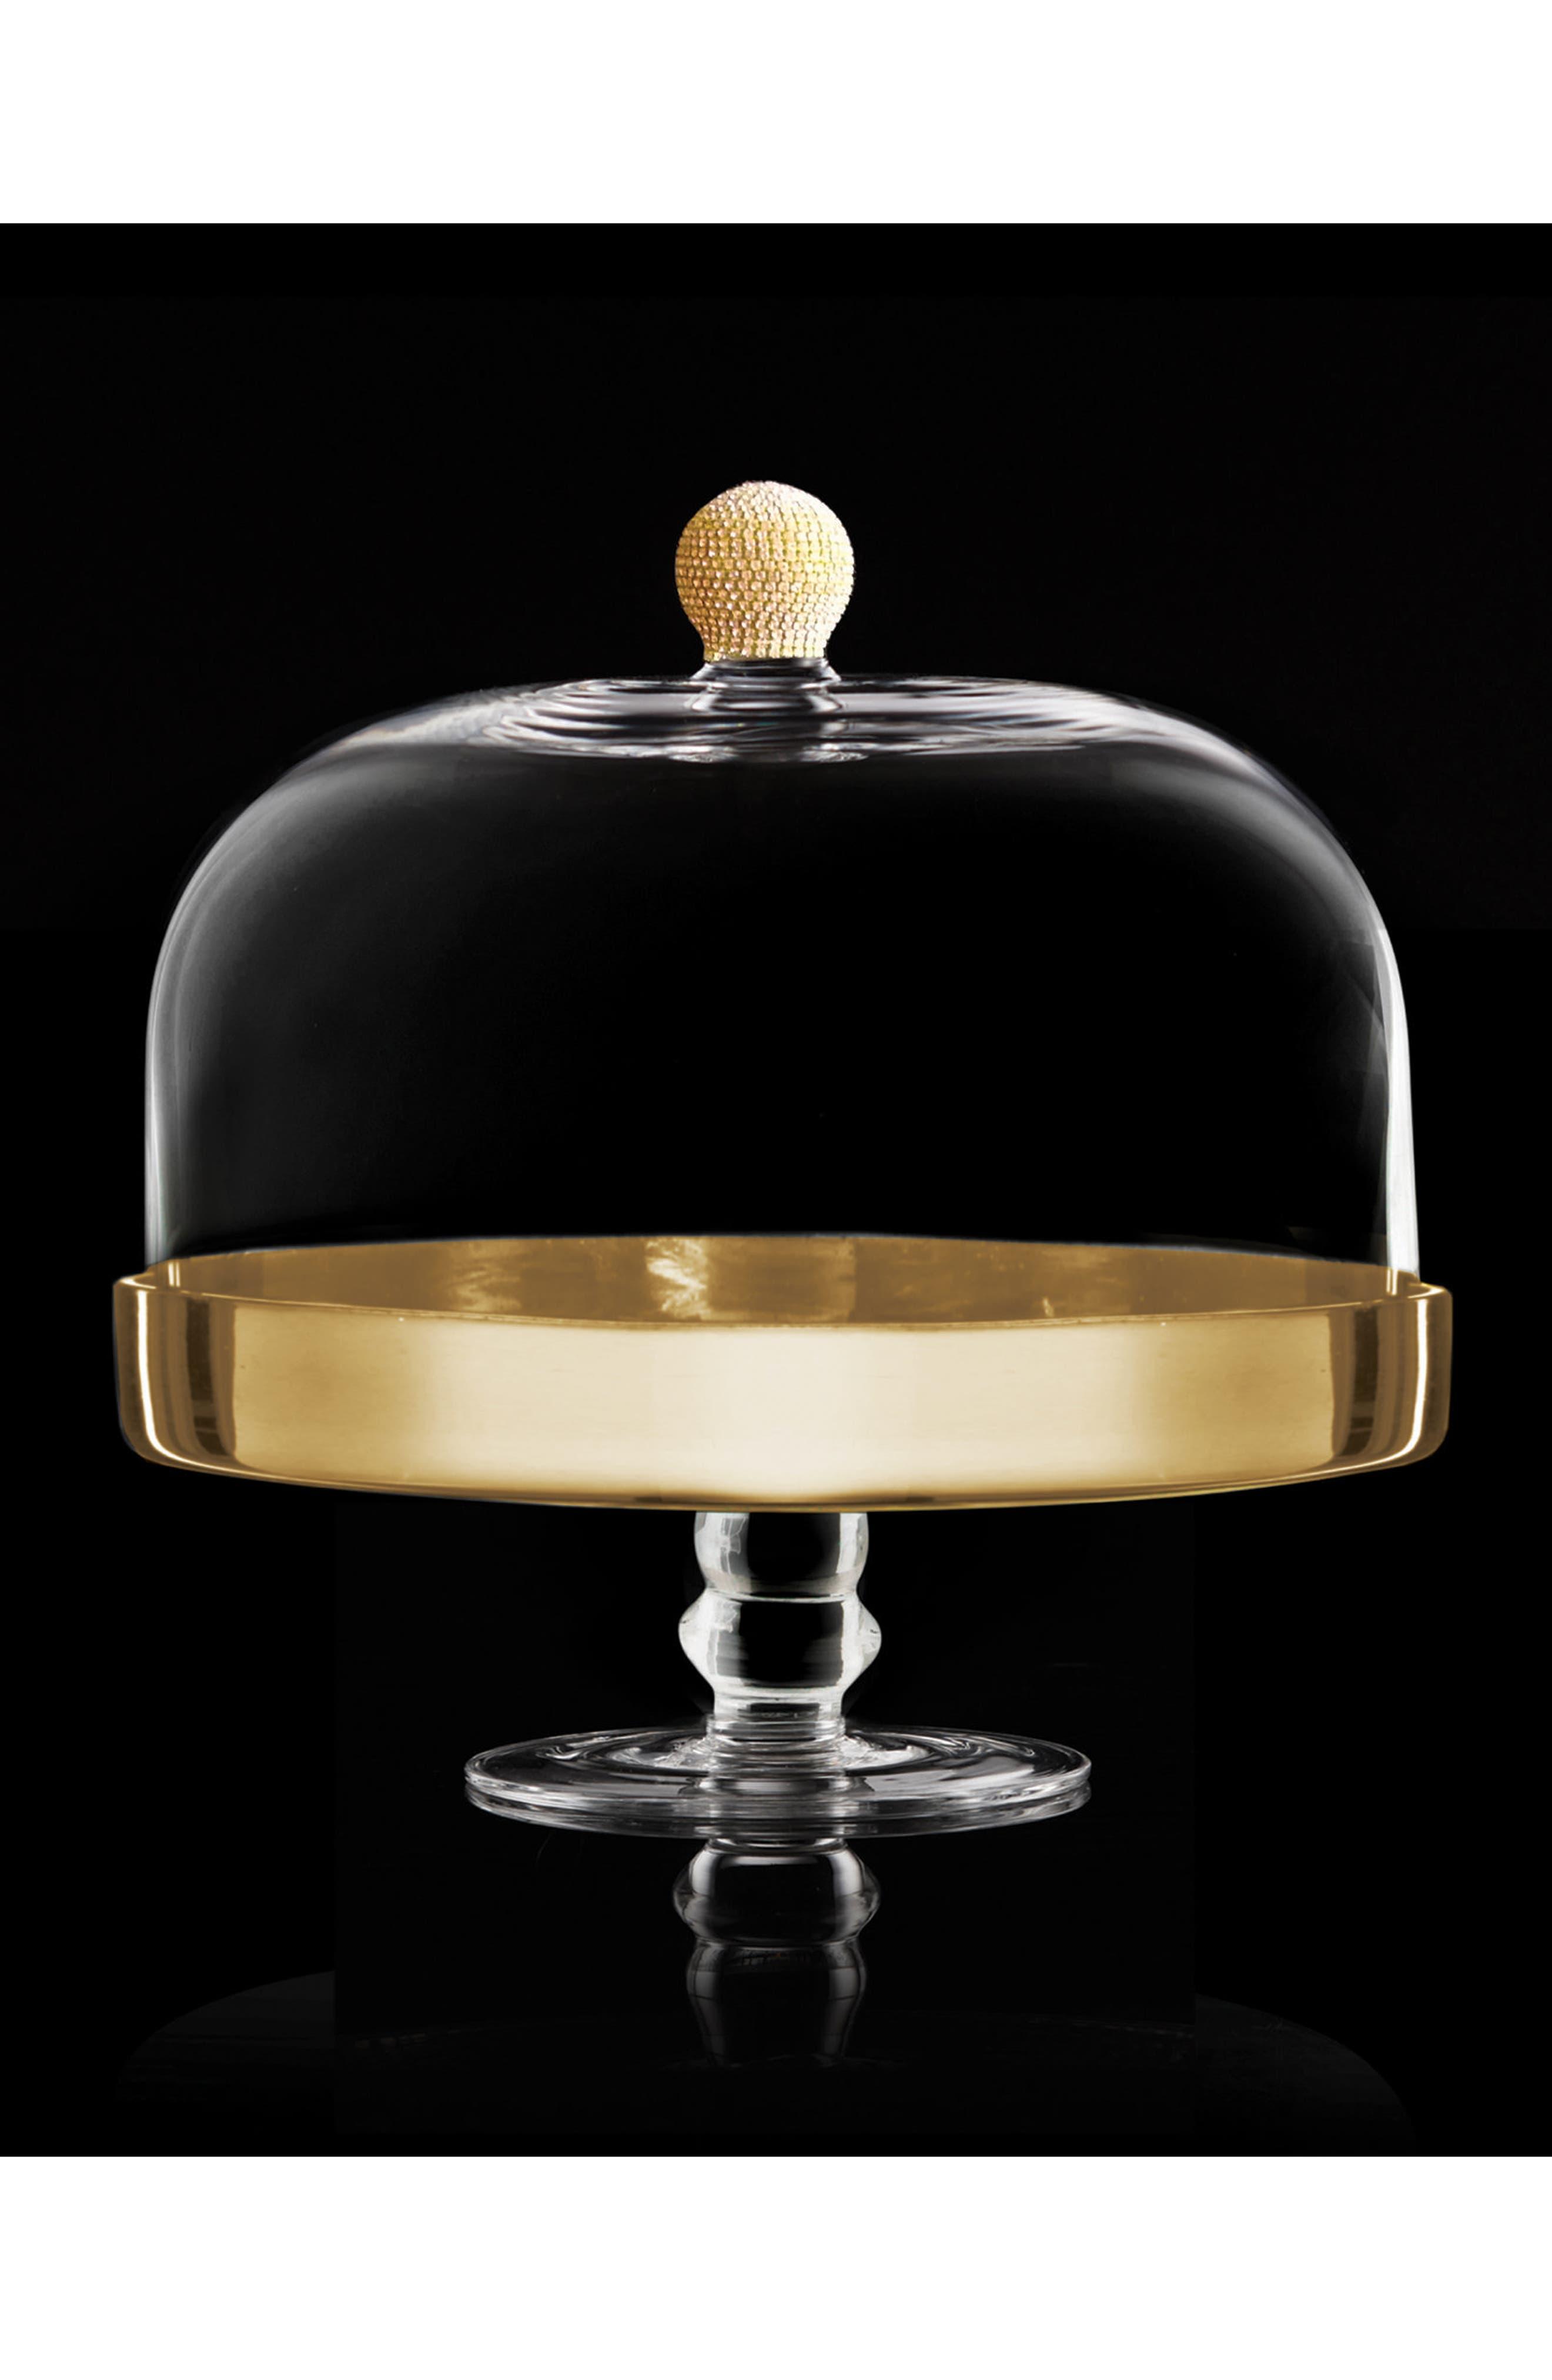 Gold Medley Pedestal Plate & Dome,                             Alternate thumbnail 2, color,                             710